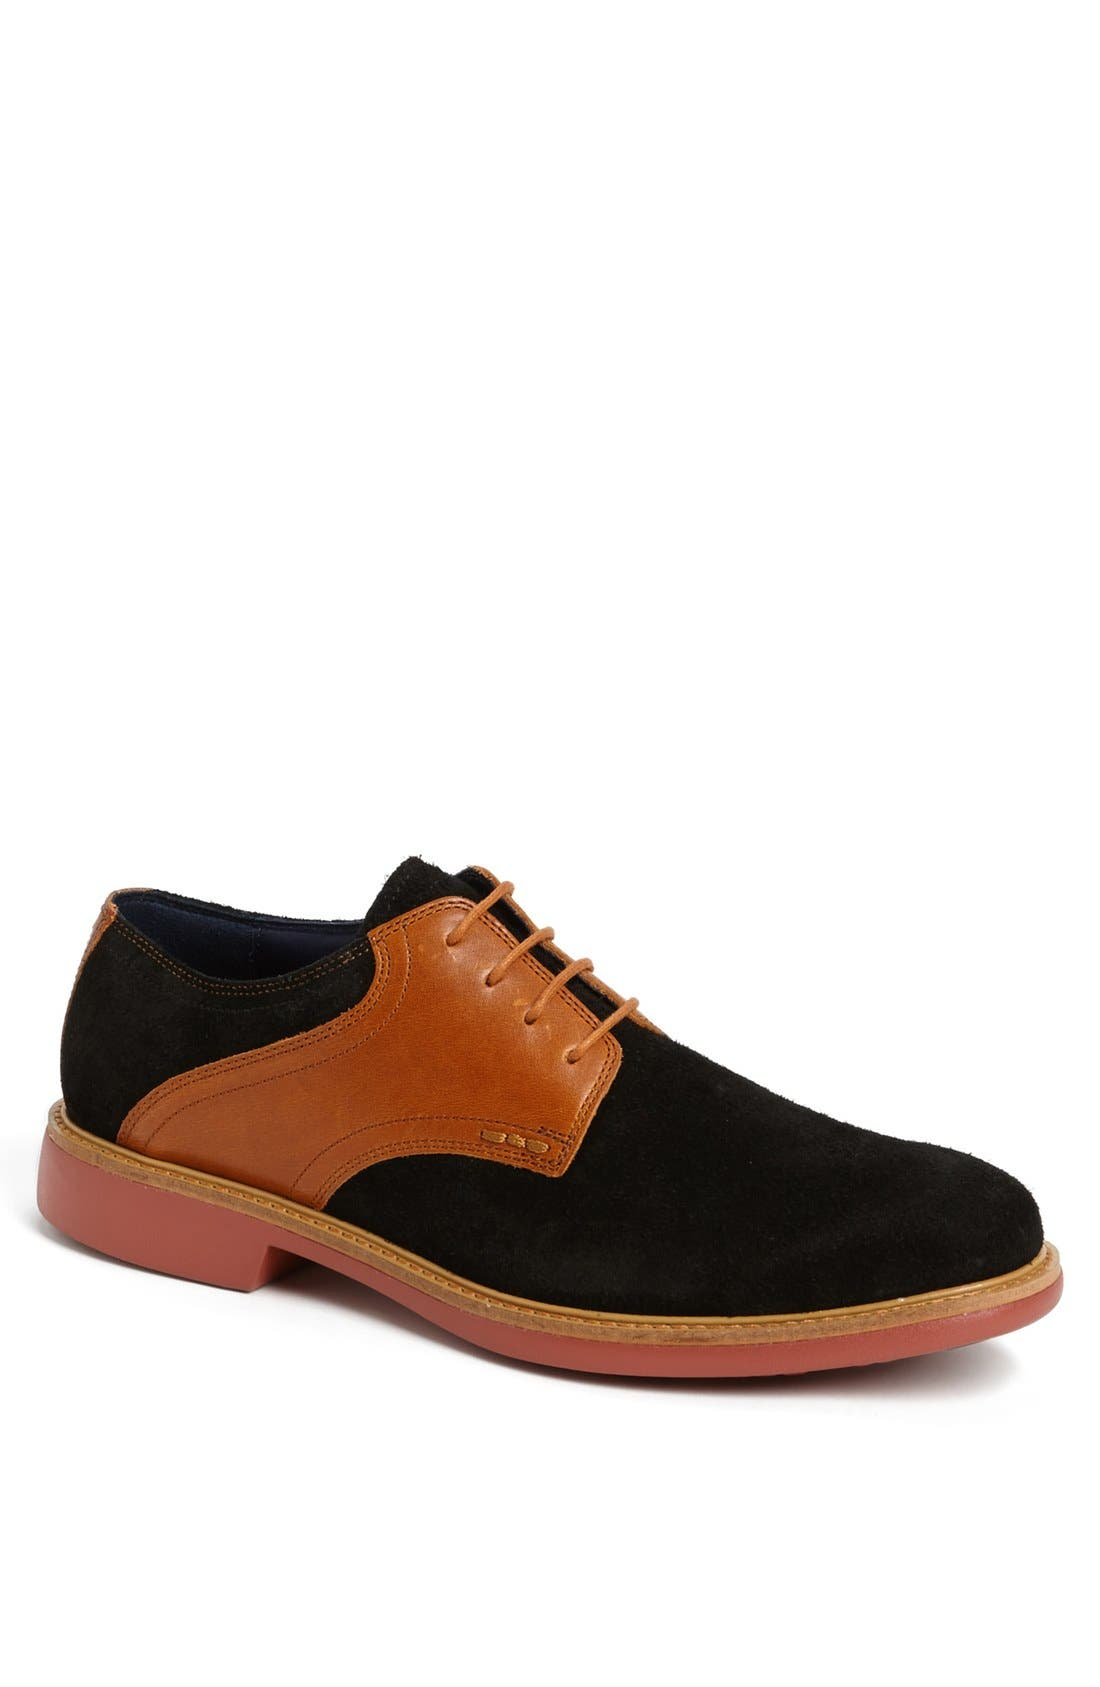 COLE HAAN, 'Great Jones' Saddle Shoe, Main thumbnail 1, color, 001